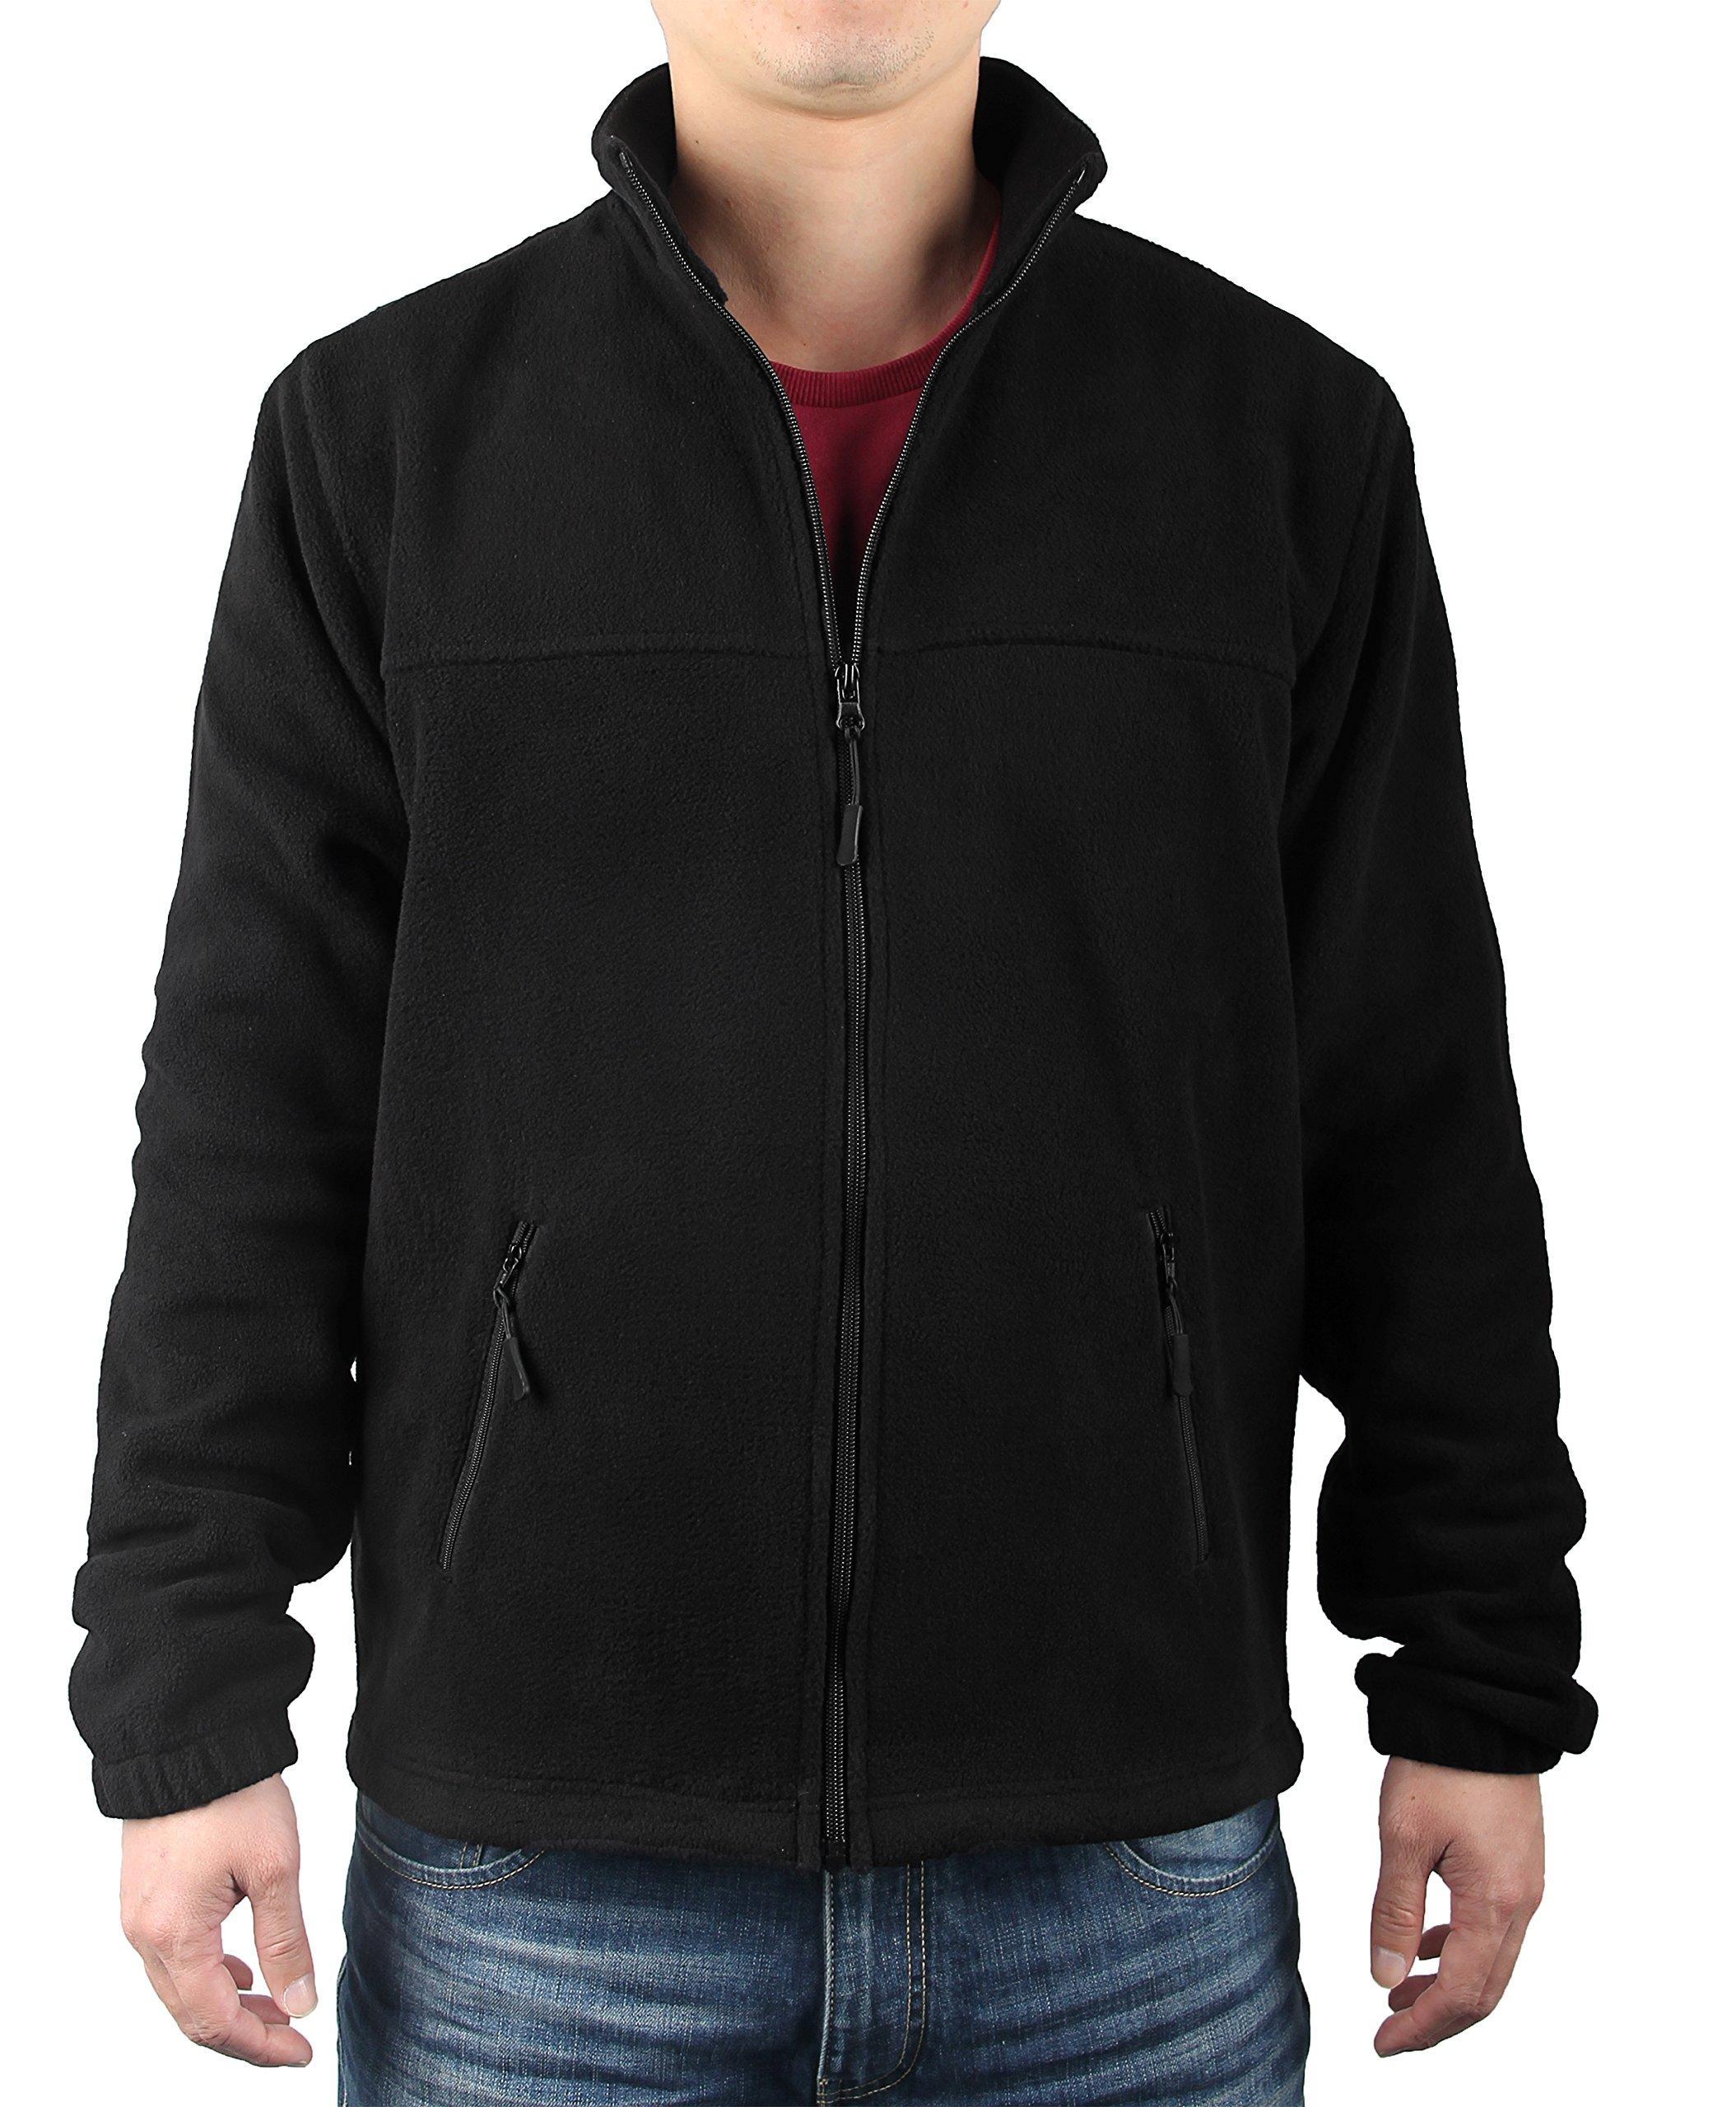 iLoveSIA Men's Fleece Casual Classic Warm Full Zip Jacket US Size XS Black